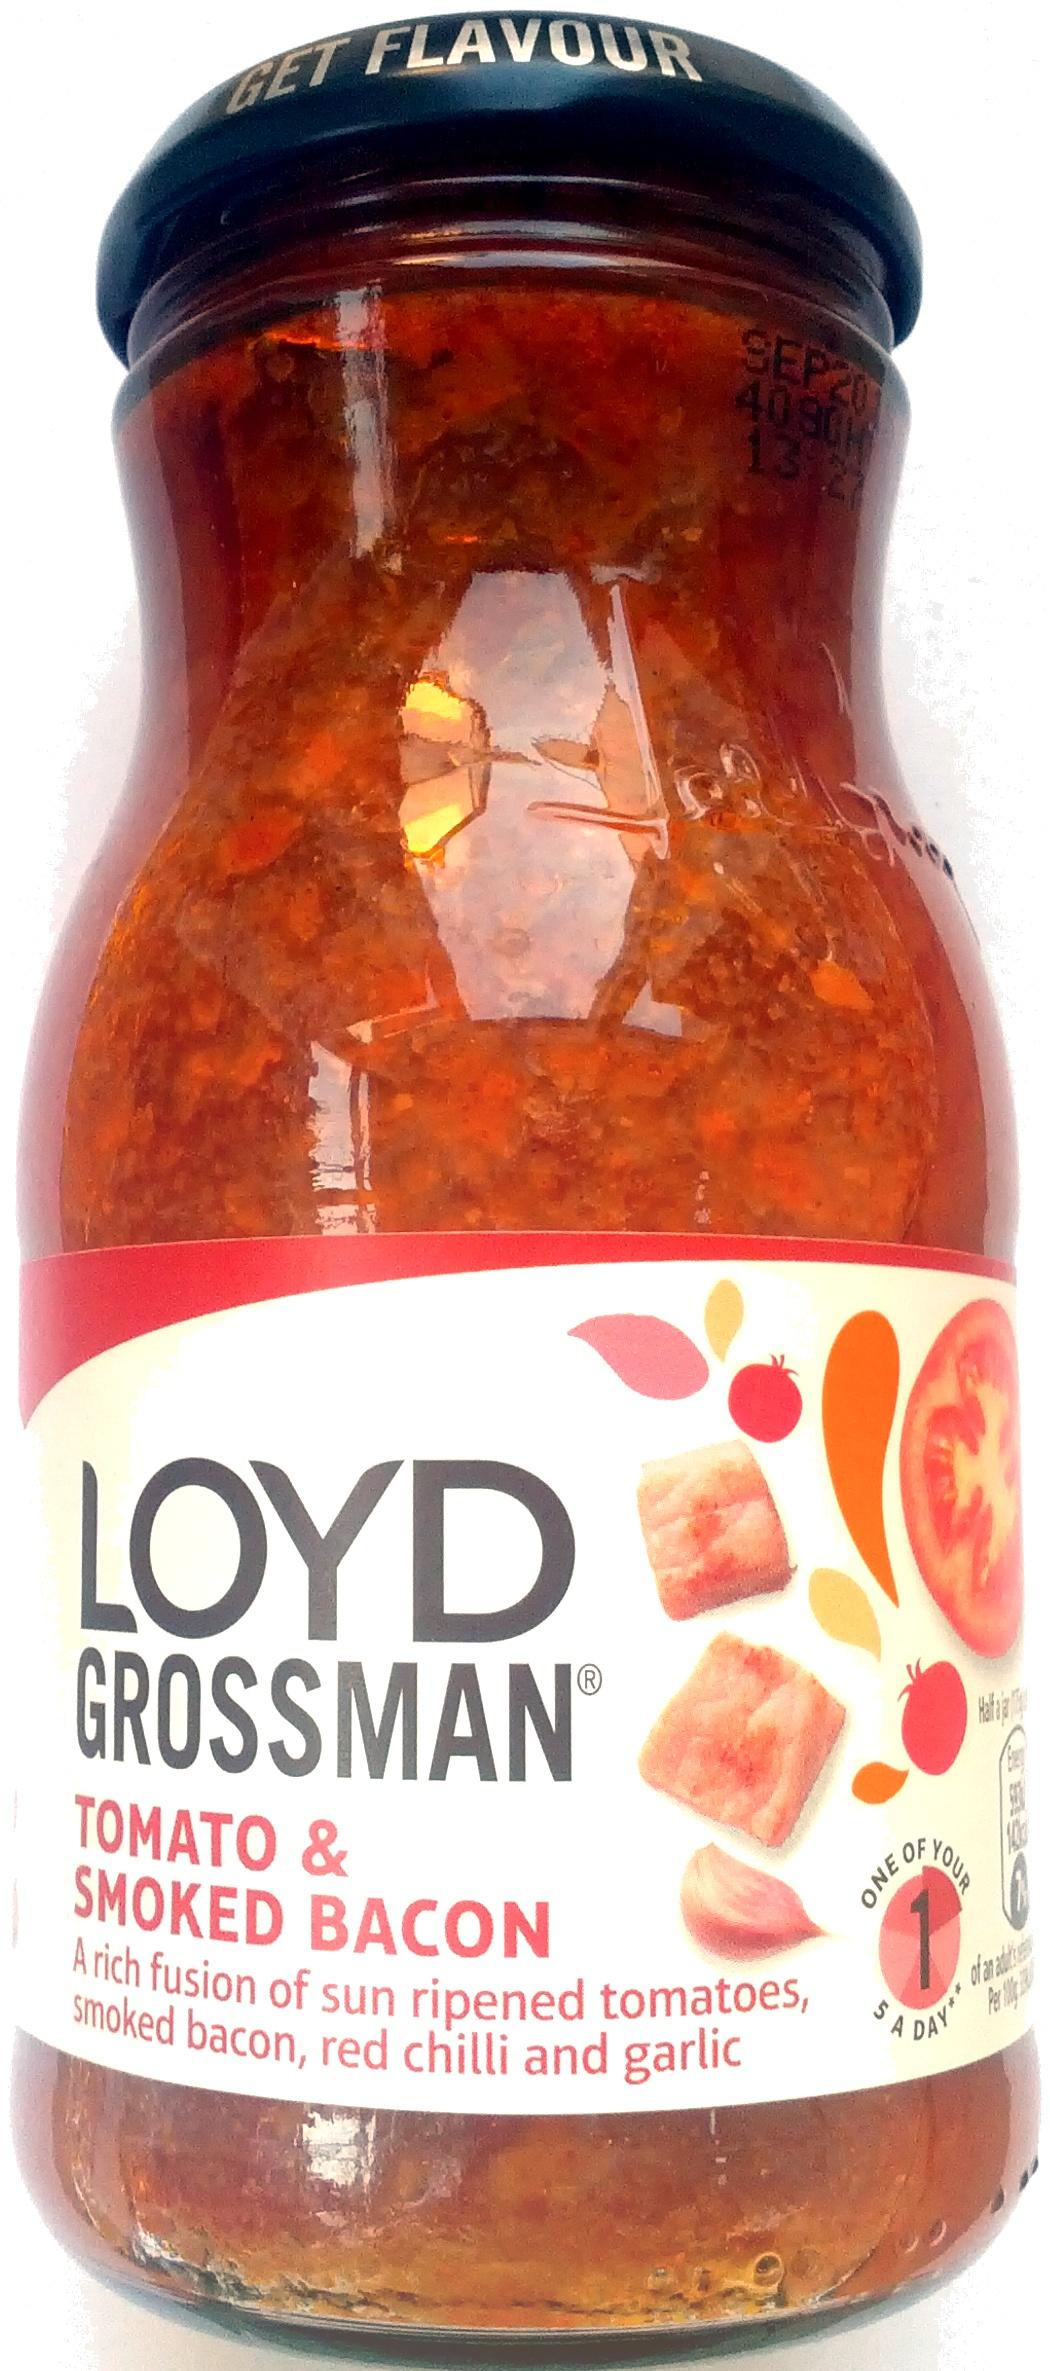 Tomato & Smoked Bacon Sauce - Product